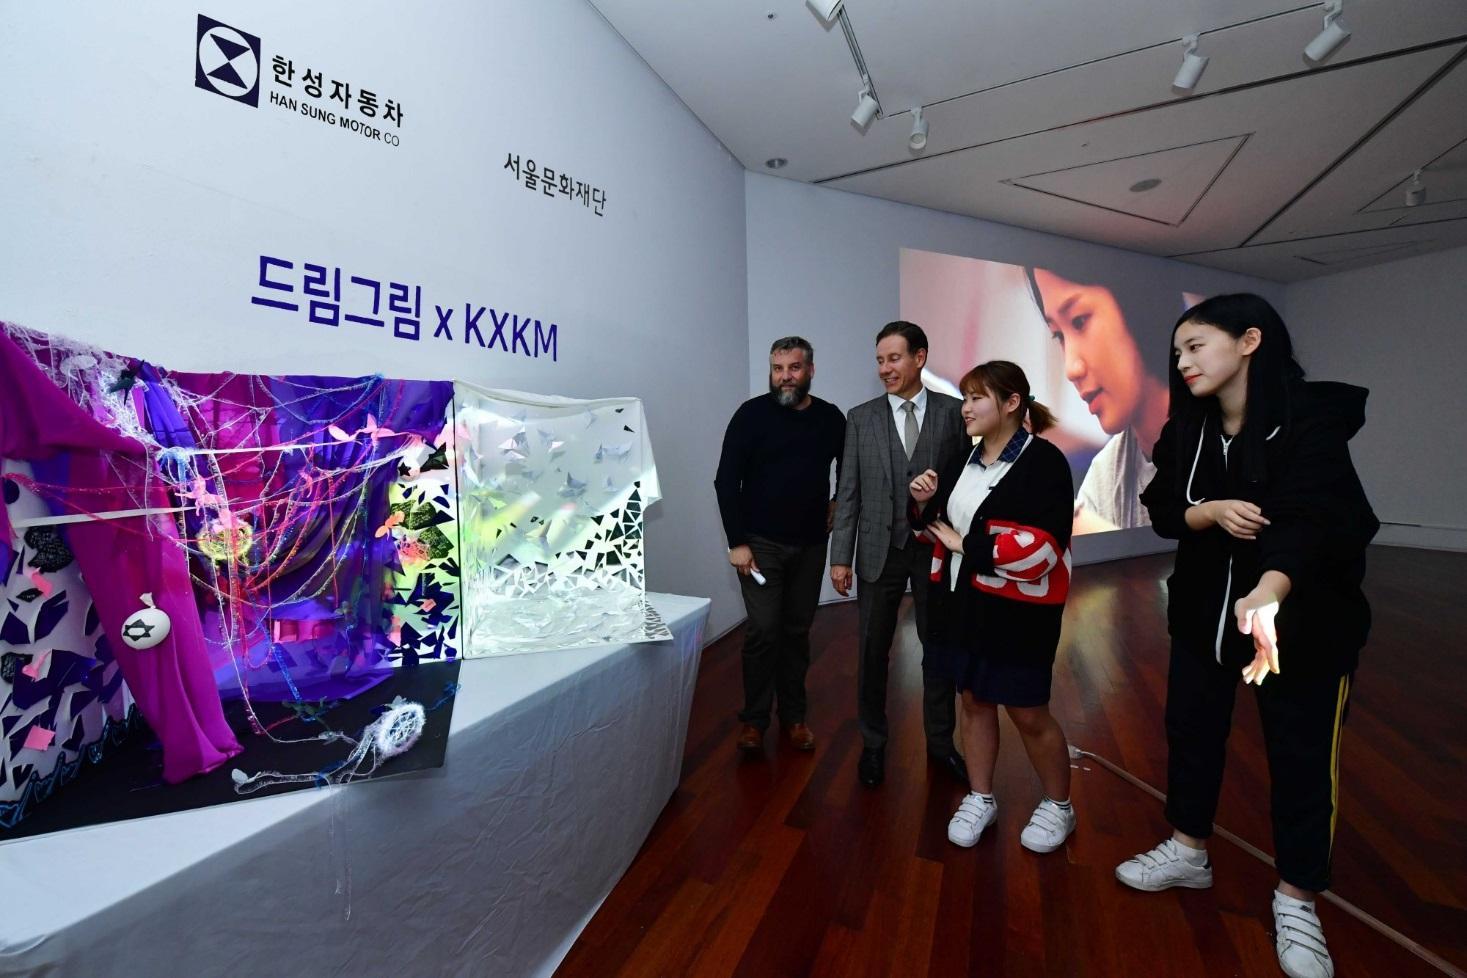 R:\ClientServing\Han Sung Motor\16. Photo\2018.10.02 SFAC 서울거리예술축제 행사\선별\보도자료 최종\181002[사진3].jpg